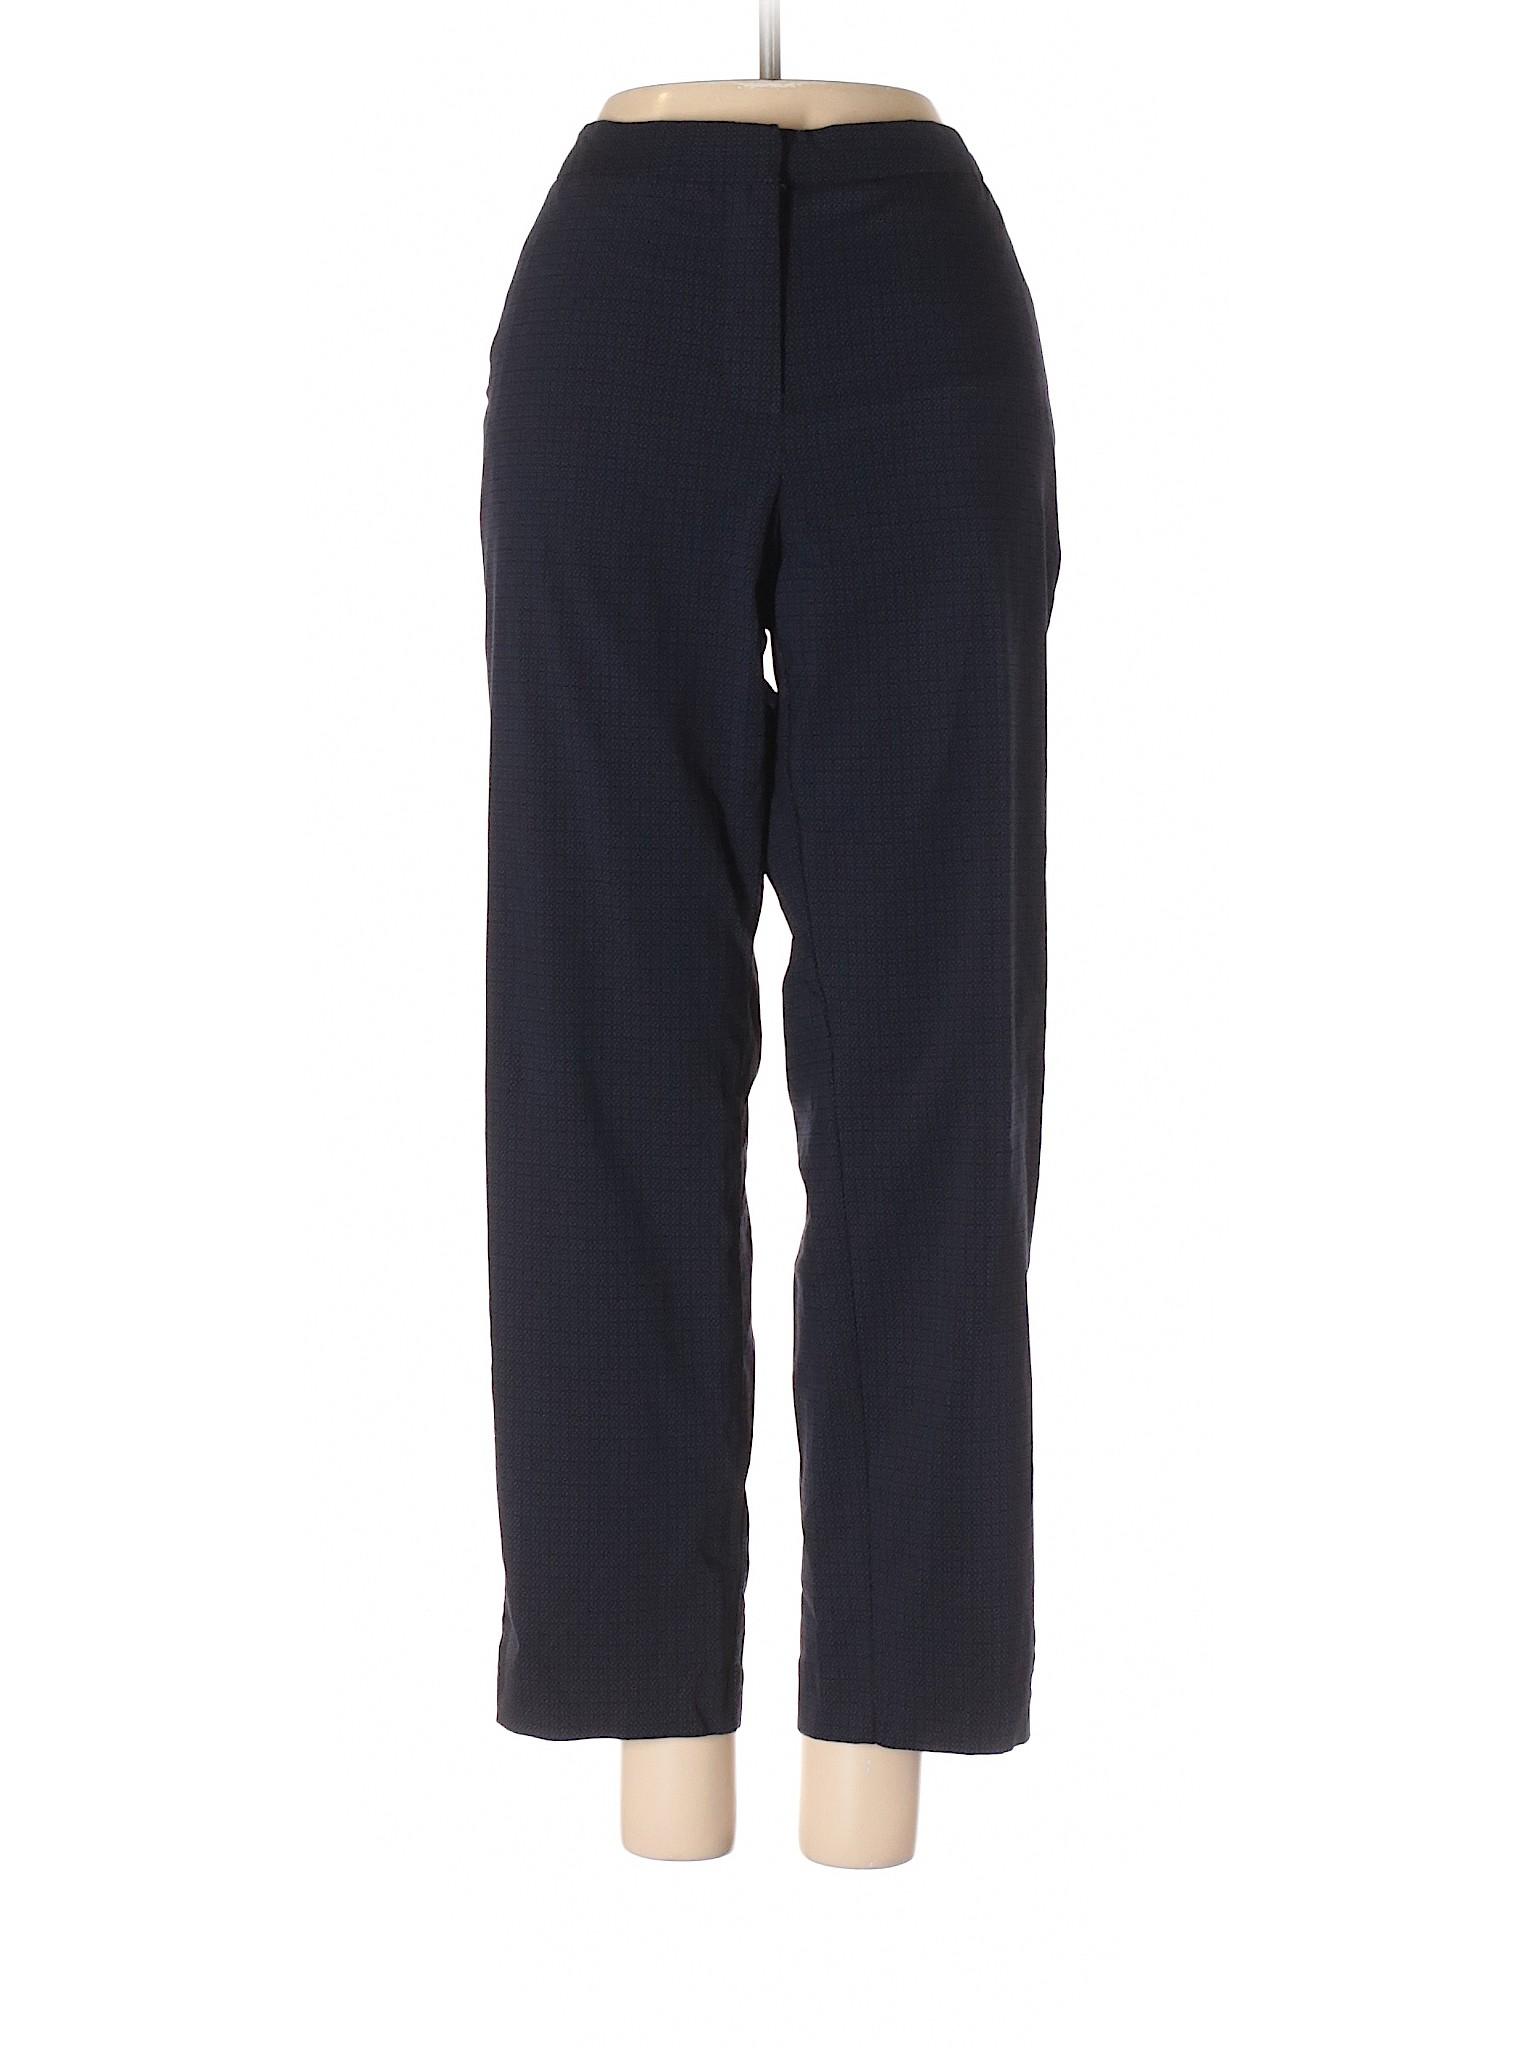 Mario leisure Dress Serrani Boutique Pants w8AqTF6